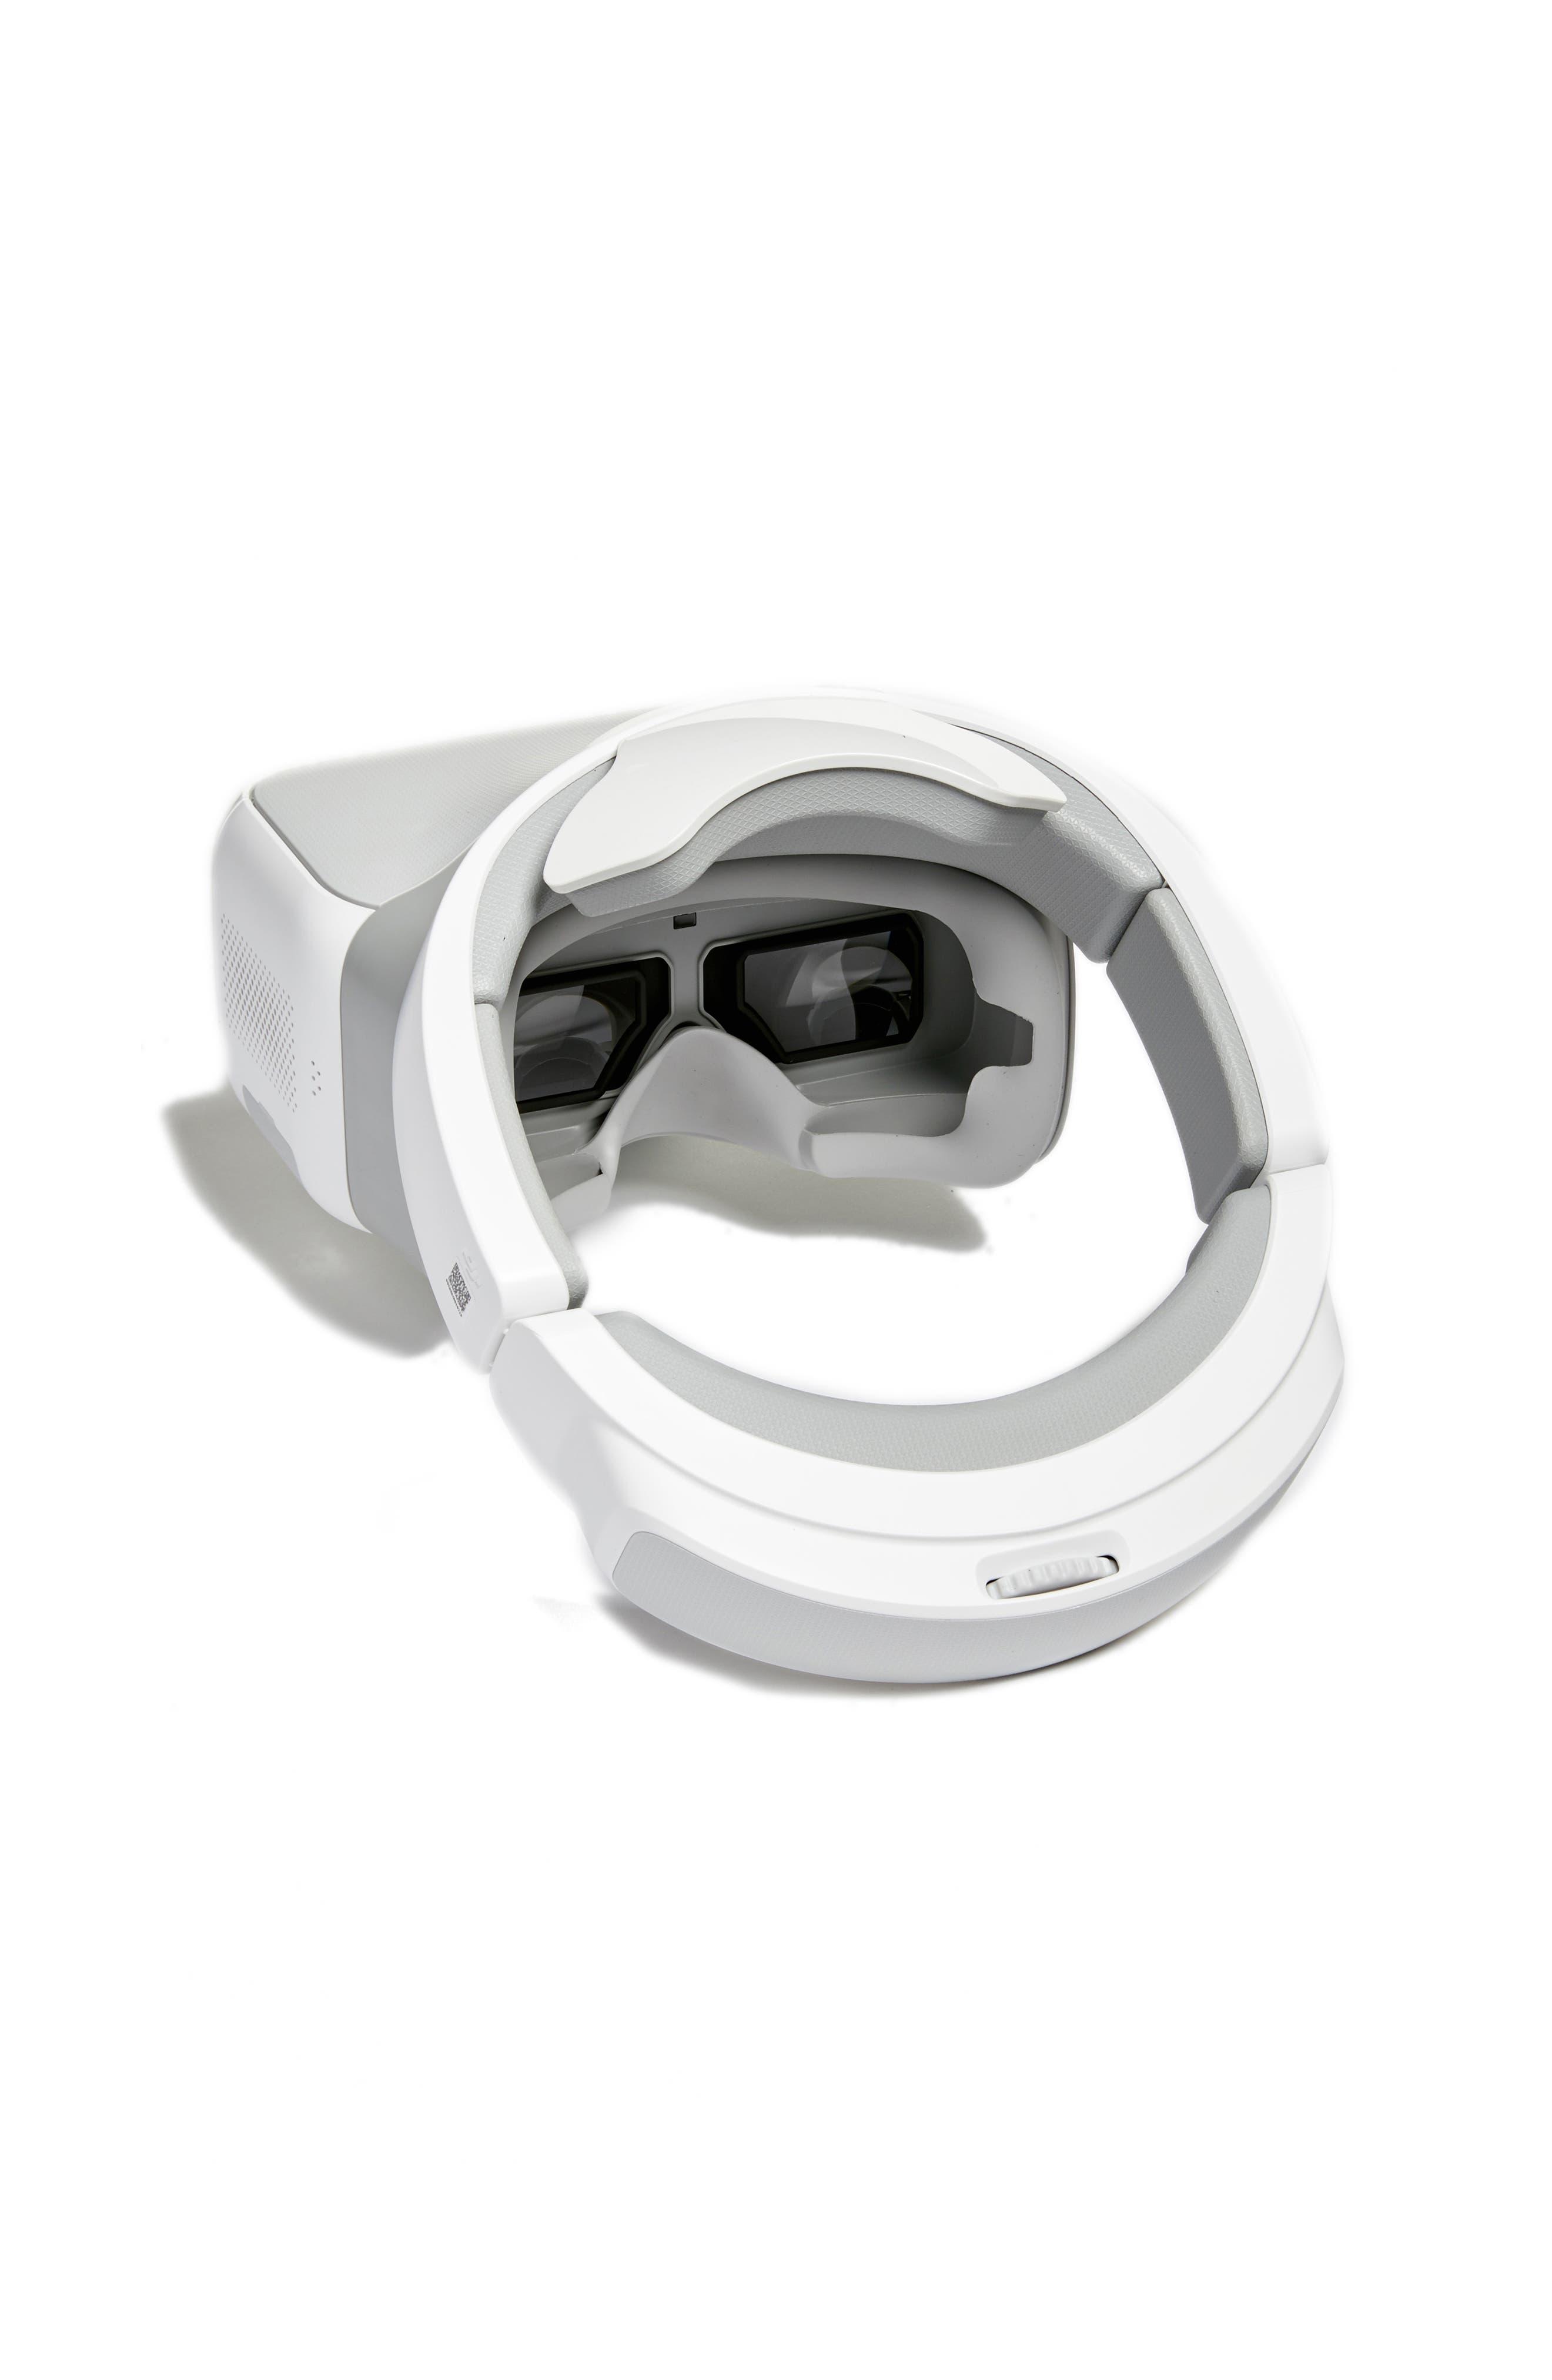 FPV Drone Goggles,                             Alternate thumbnail 2, color,                             White